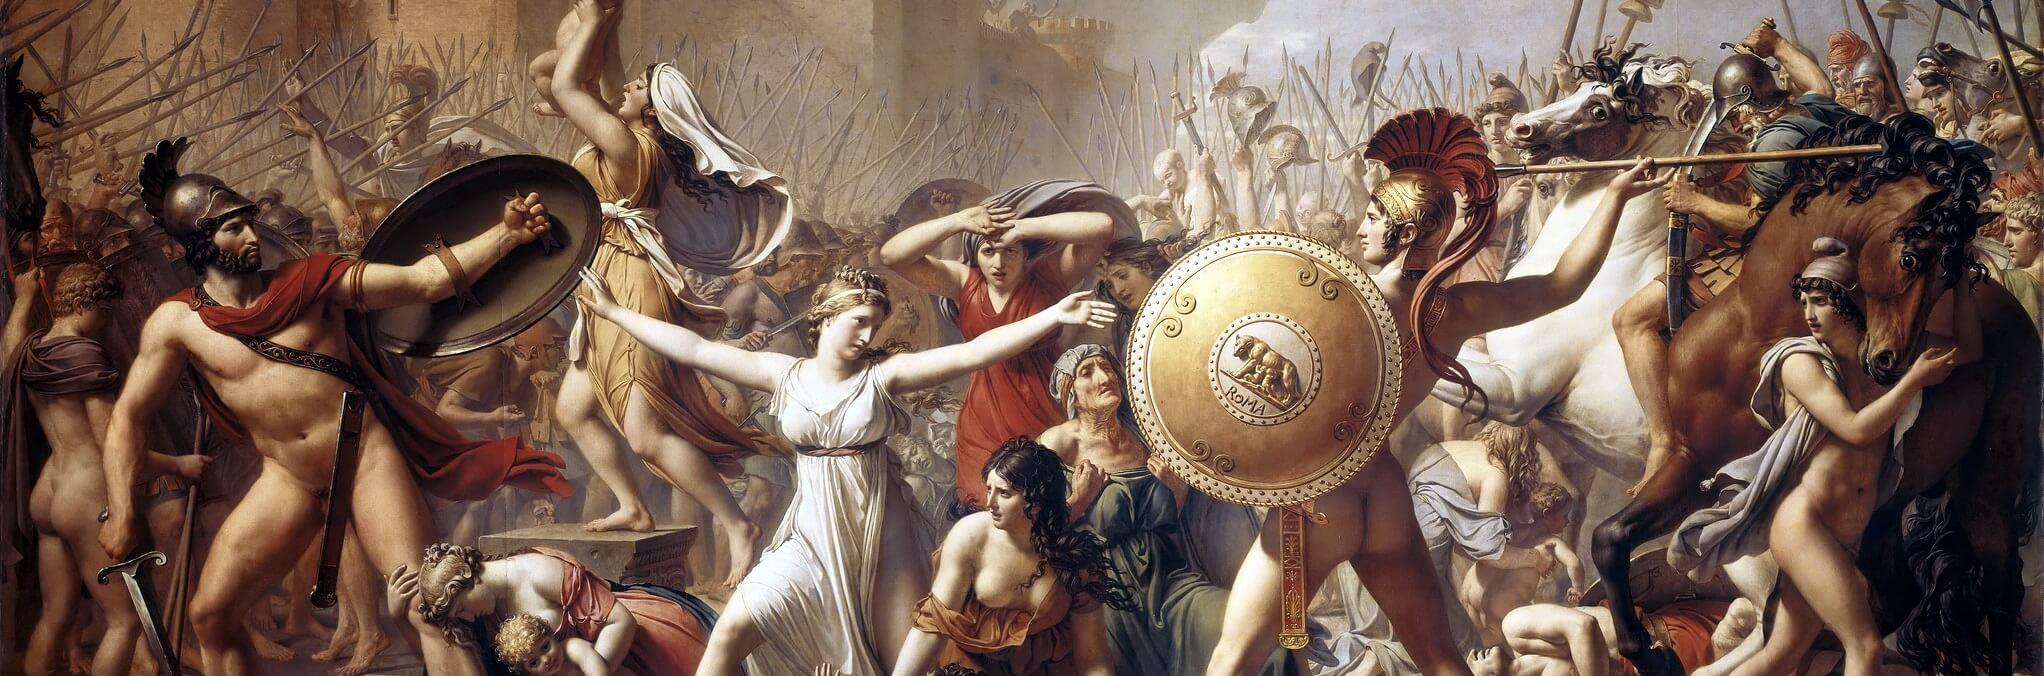 Artistes - Jacques-Louis David